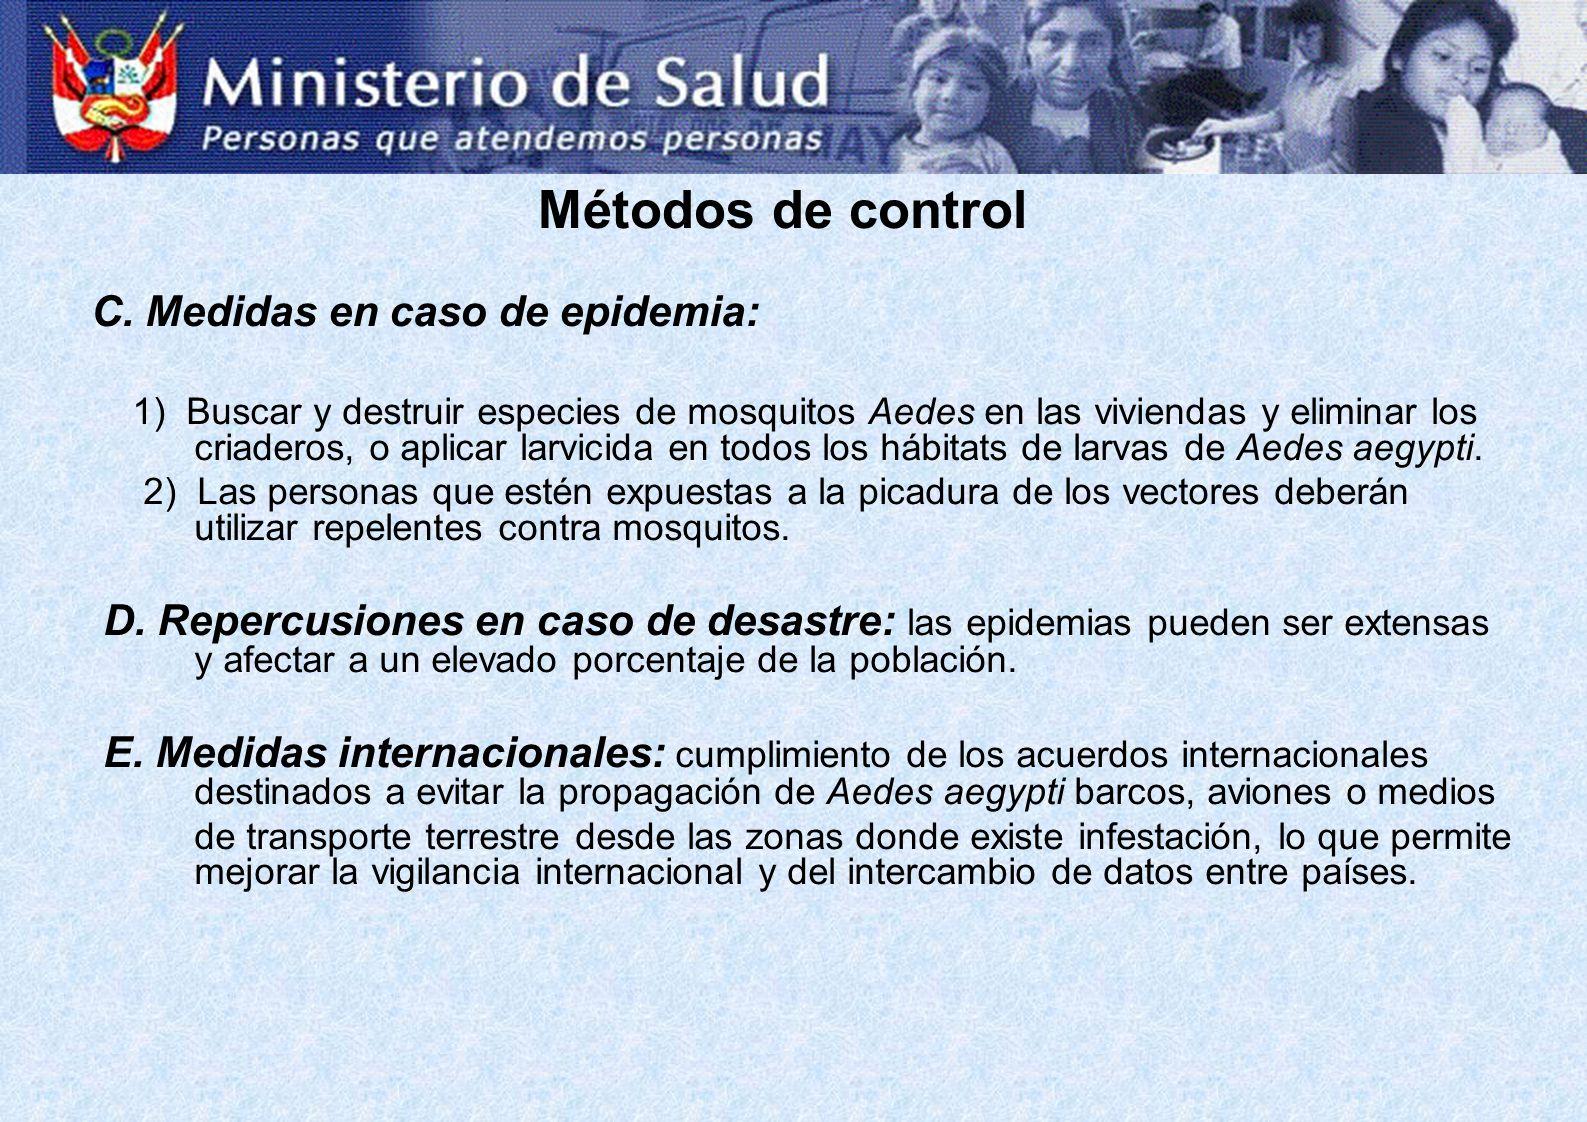 Métodos de control C. Medidas en caso de epidemia: